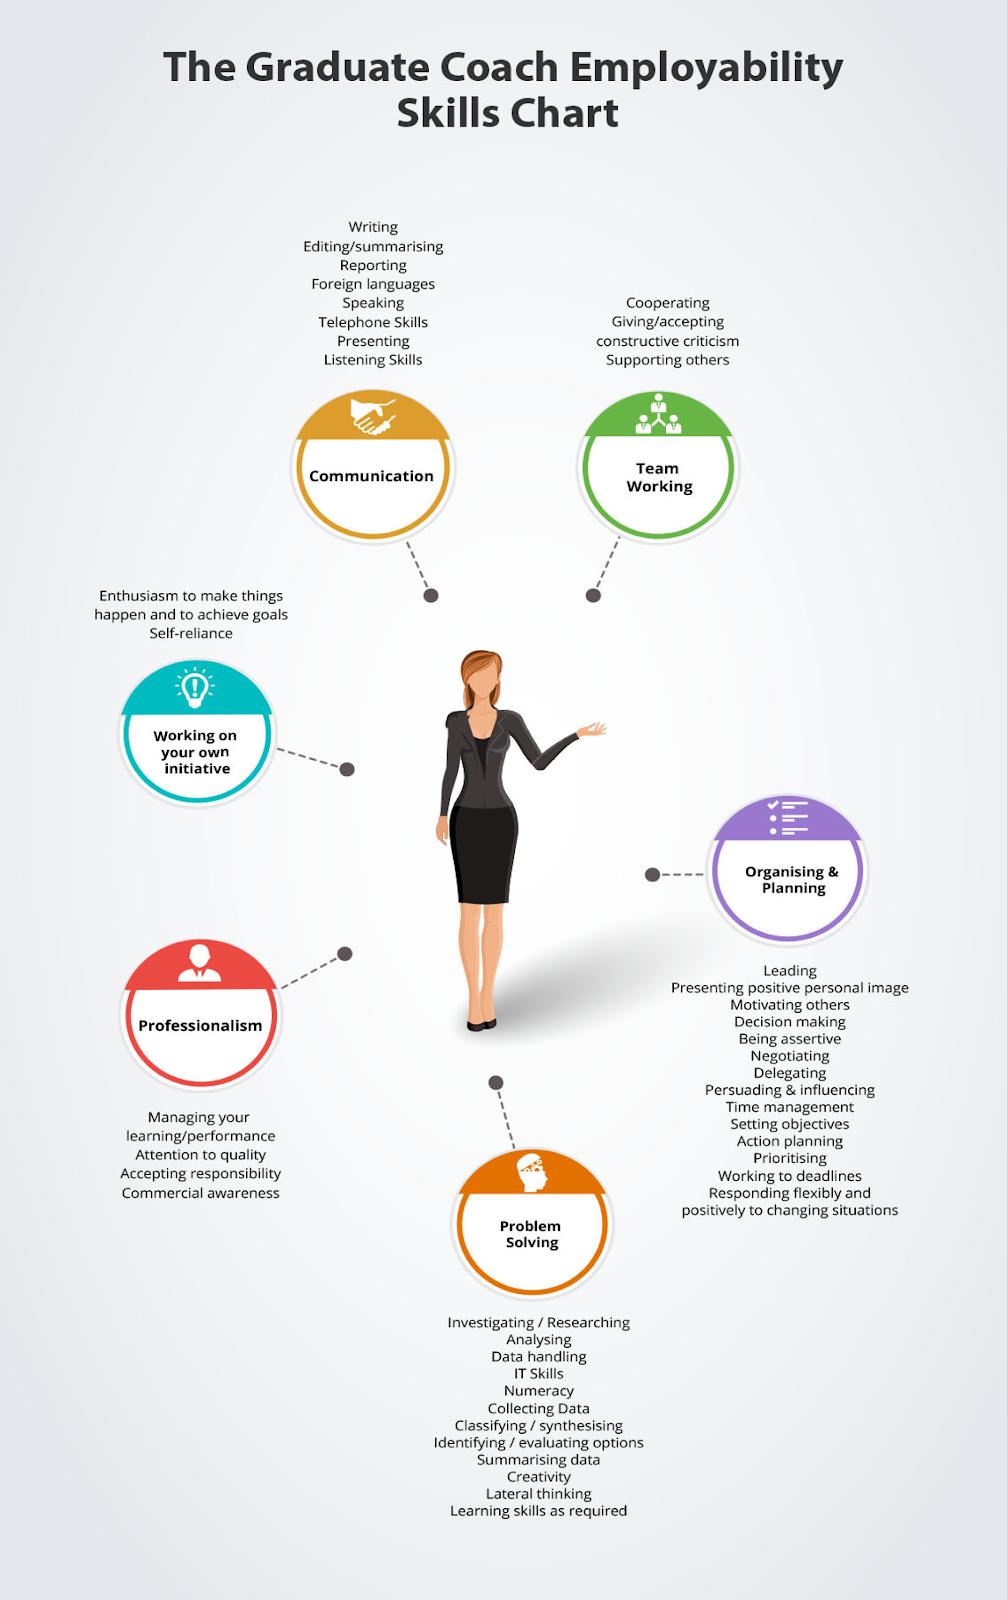 Key employability skills chart